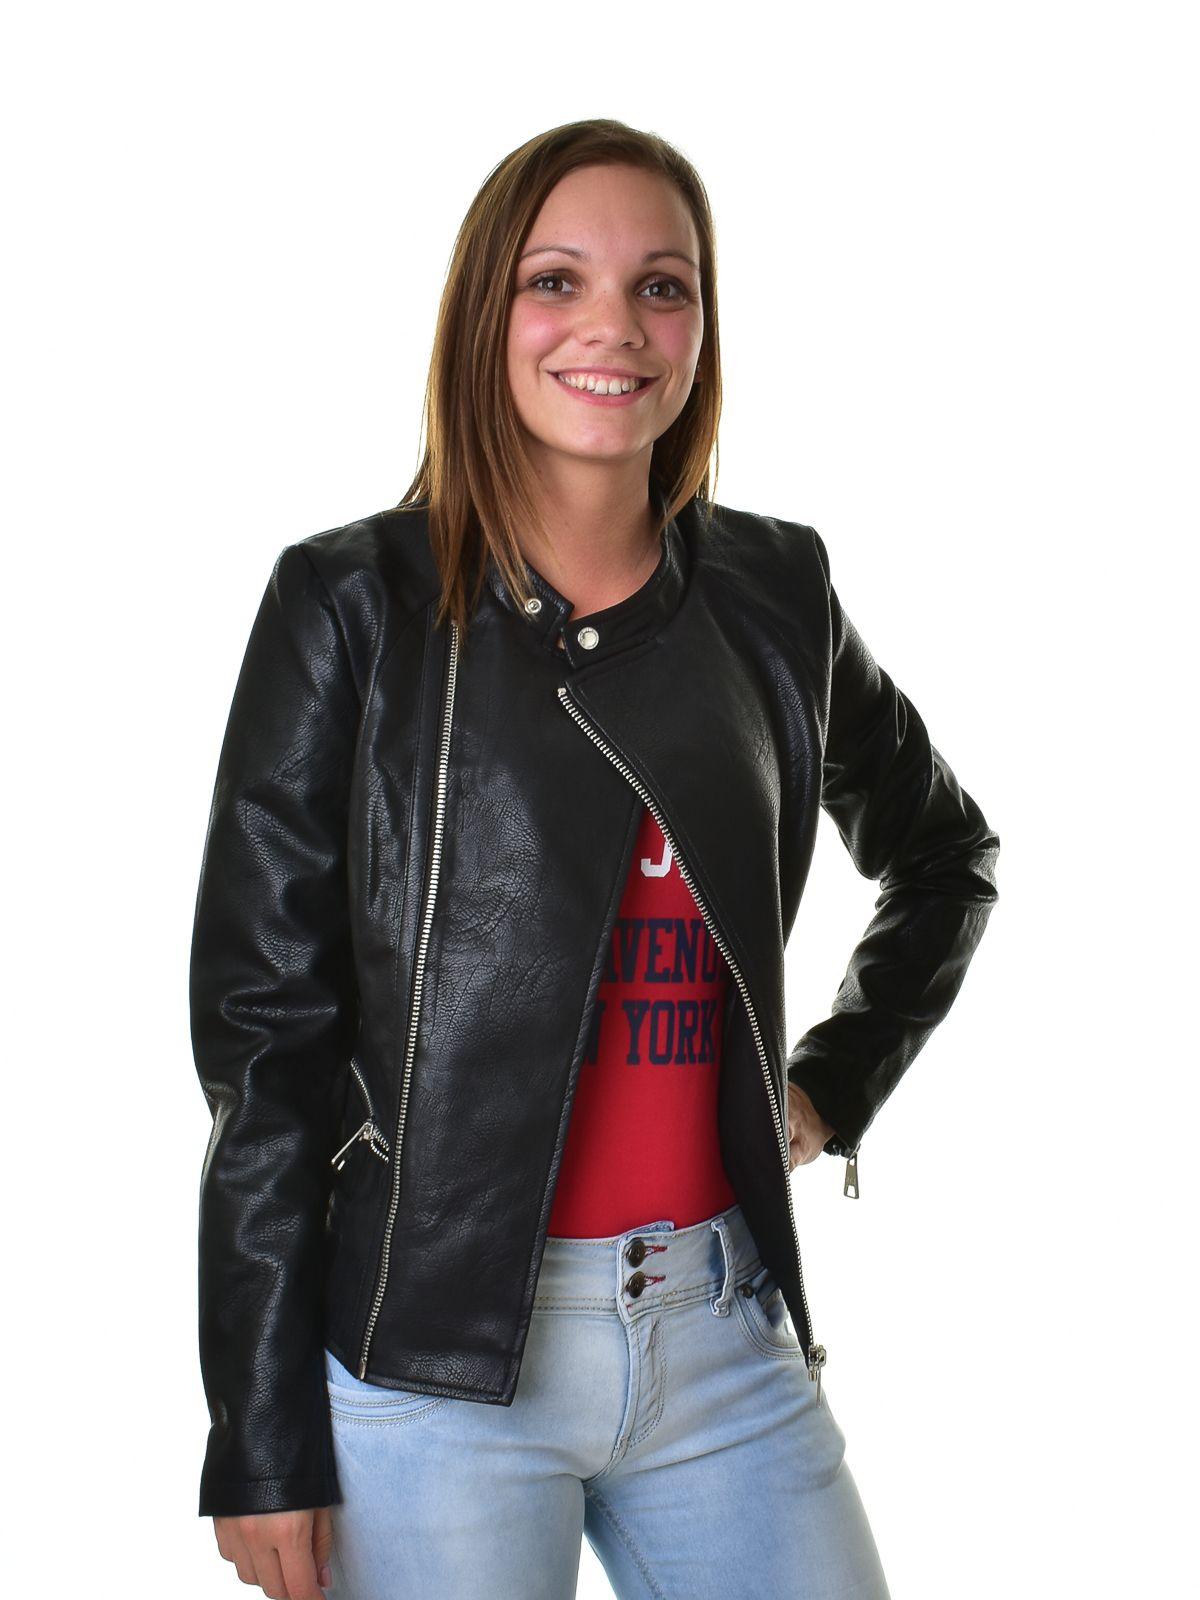 Retro Jeans női dzseki ITALIA   Markasbolt.hu Hivatalos